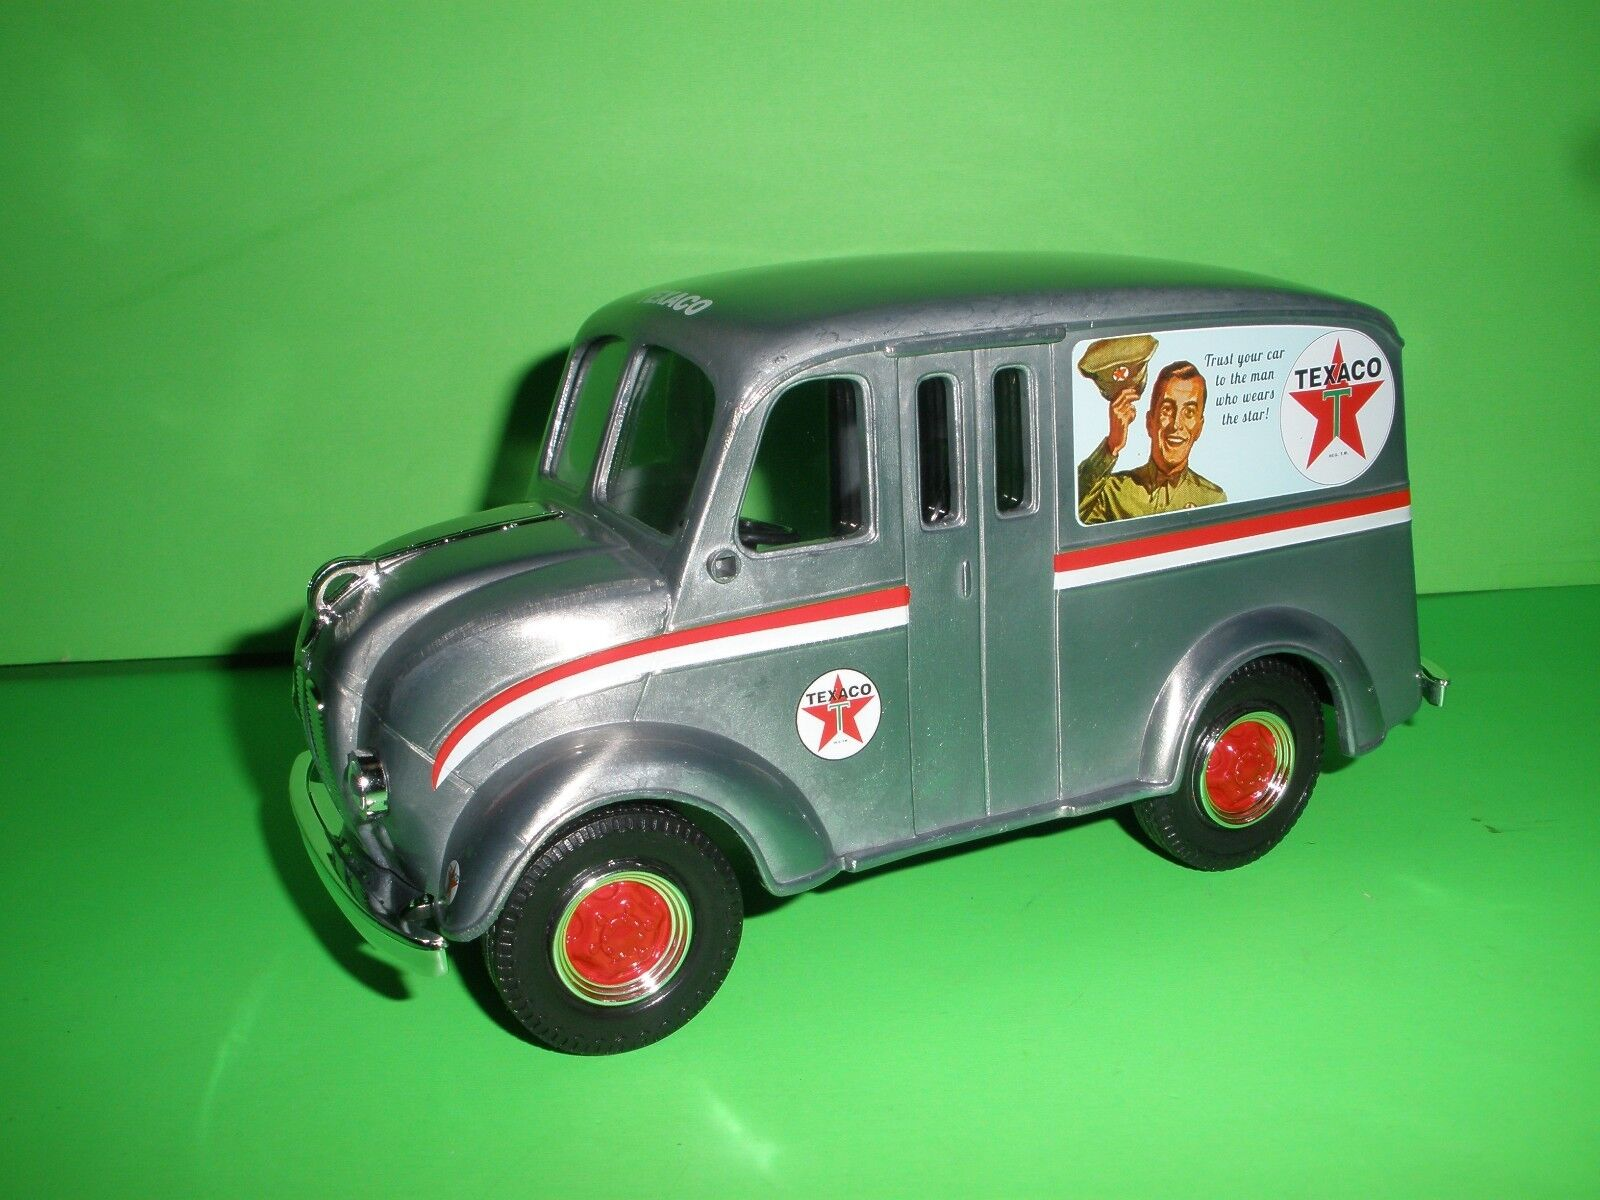 Texaco Texaco Texaco camión 1950 divco entrega paso van Edición Especial - 2014 -  31 en la serie 5c5e7a